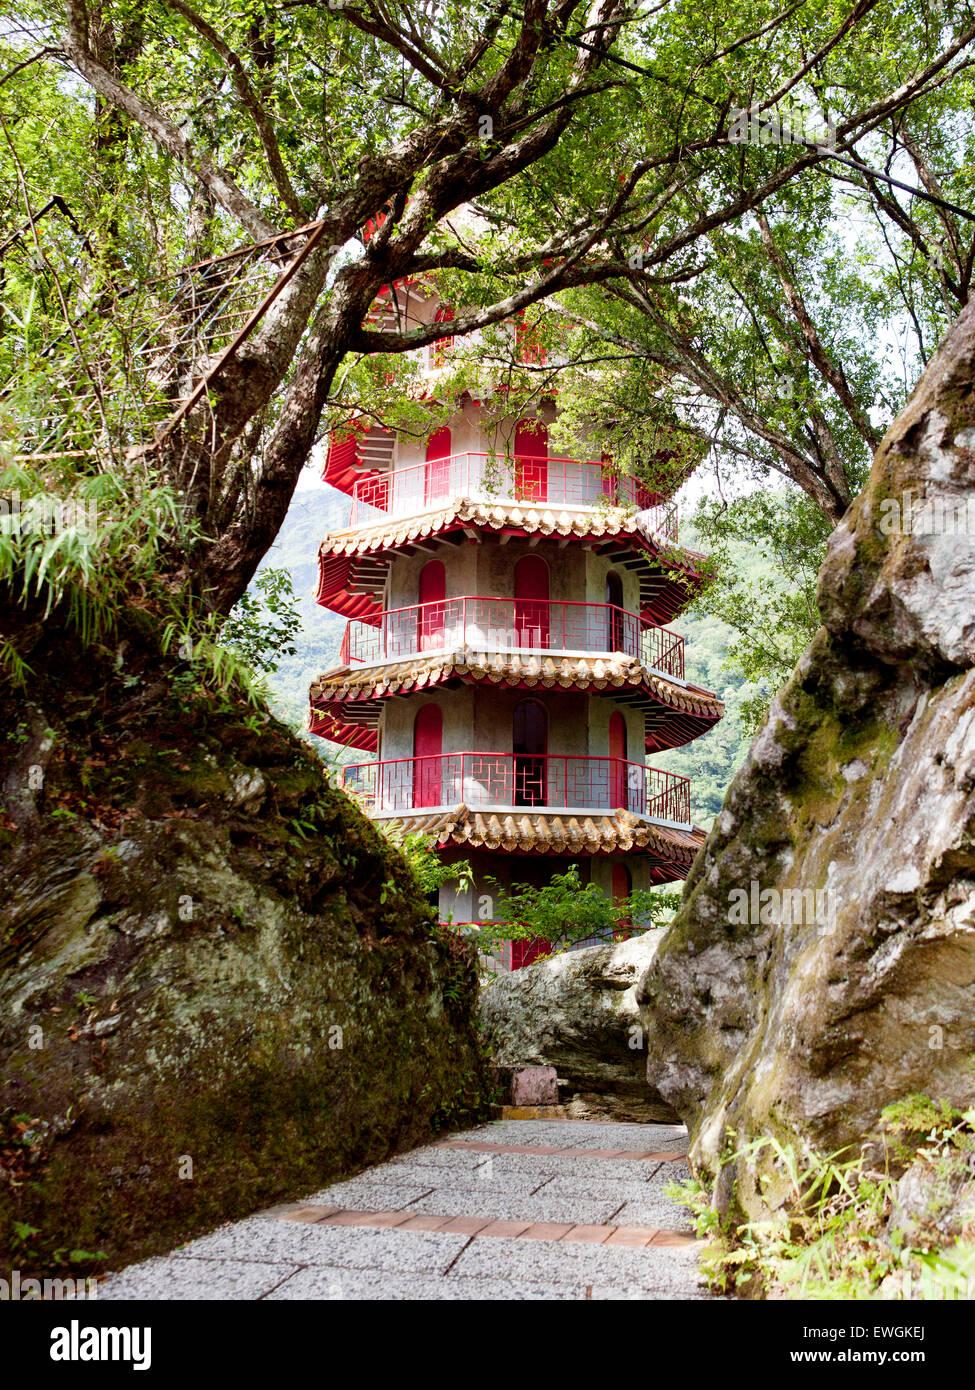 Hsiang-te (Tienhsiang ) Pagoda. Taroko Gorge. Taiwan. Immagini Stock